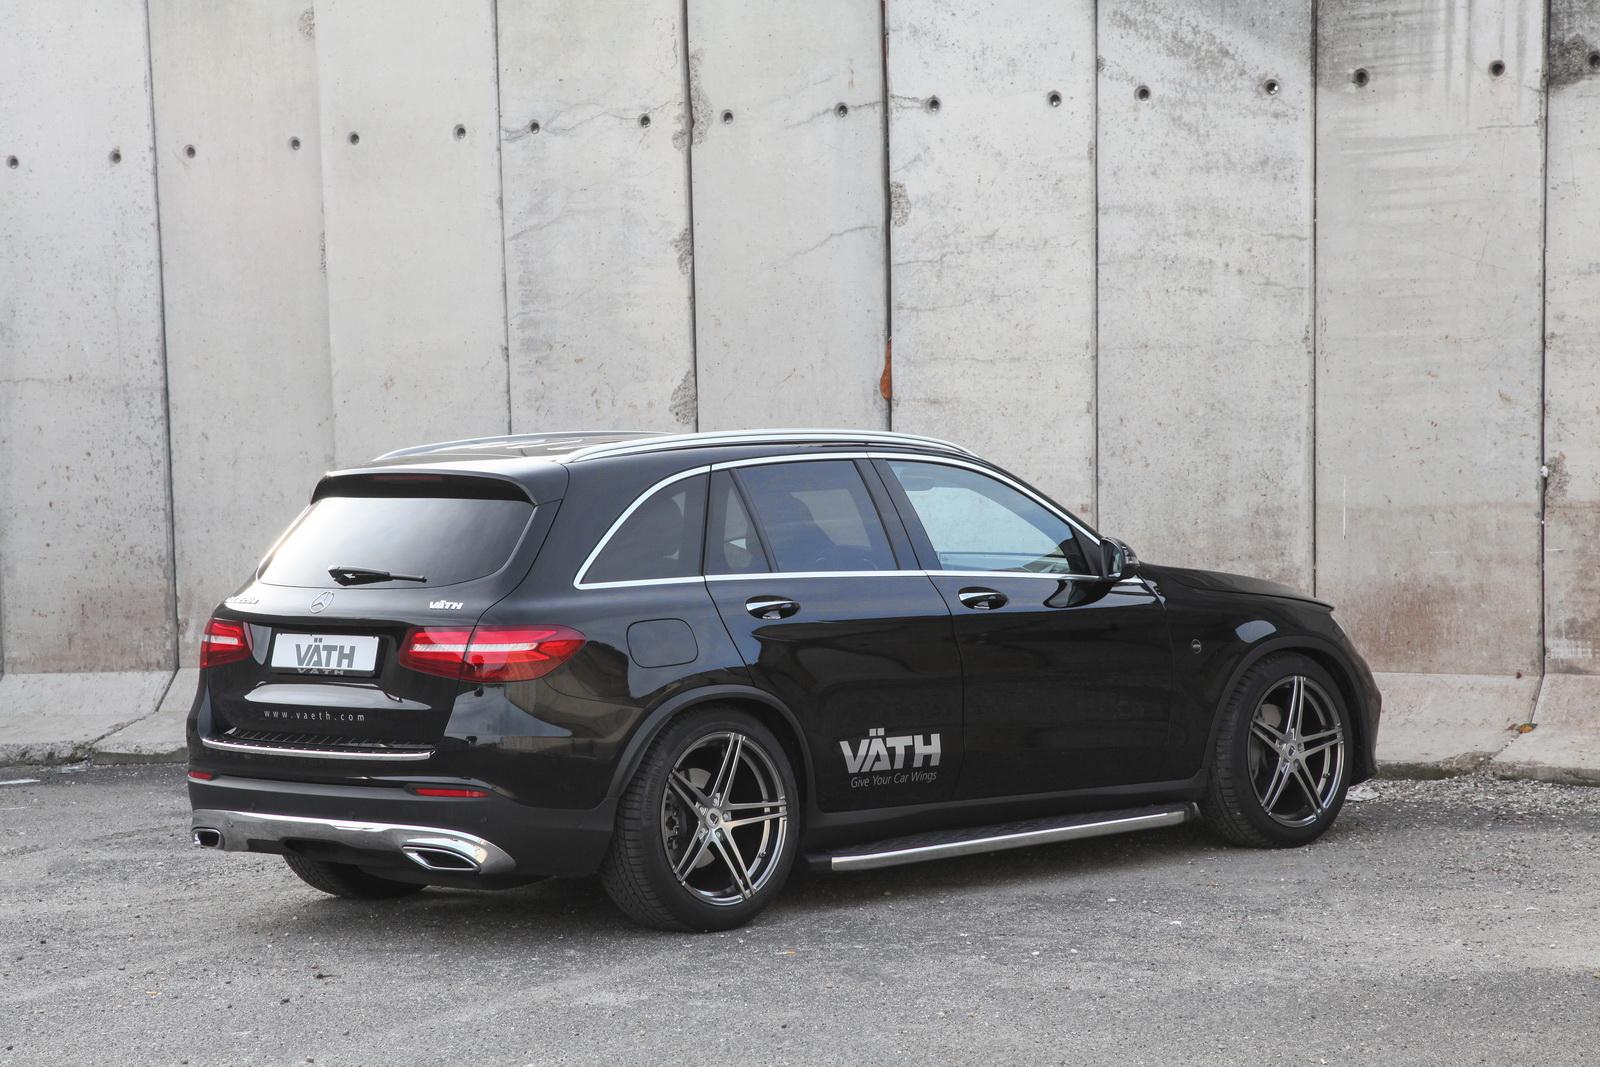 Mercedes_GLC220d_by_Vath_05